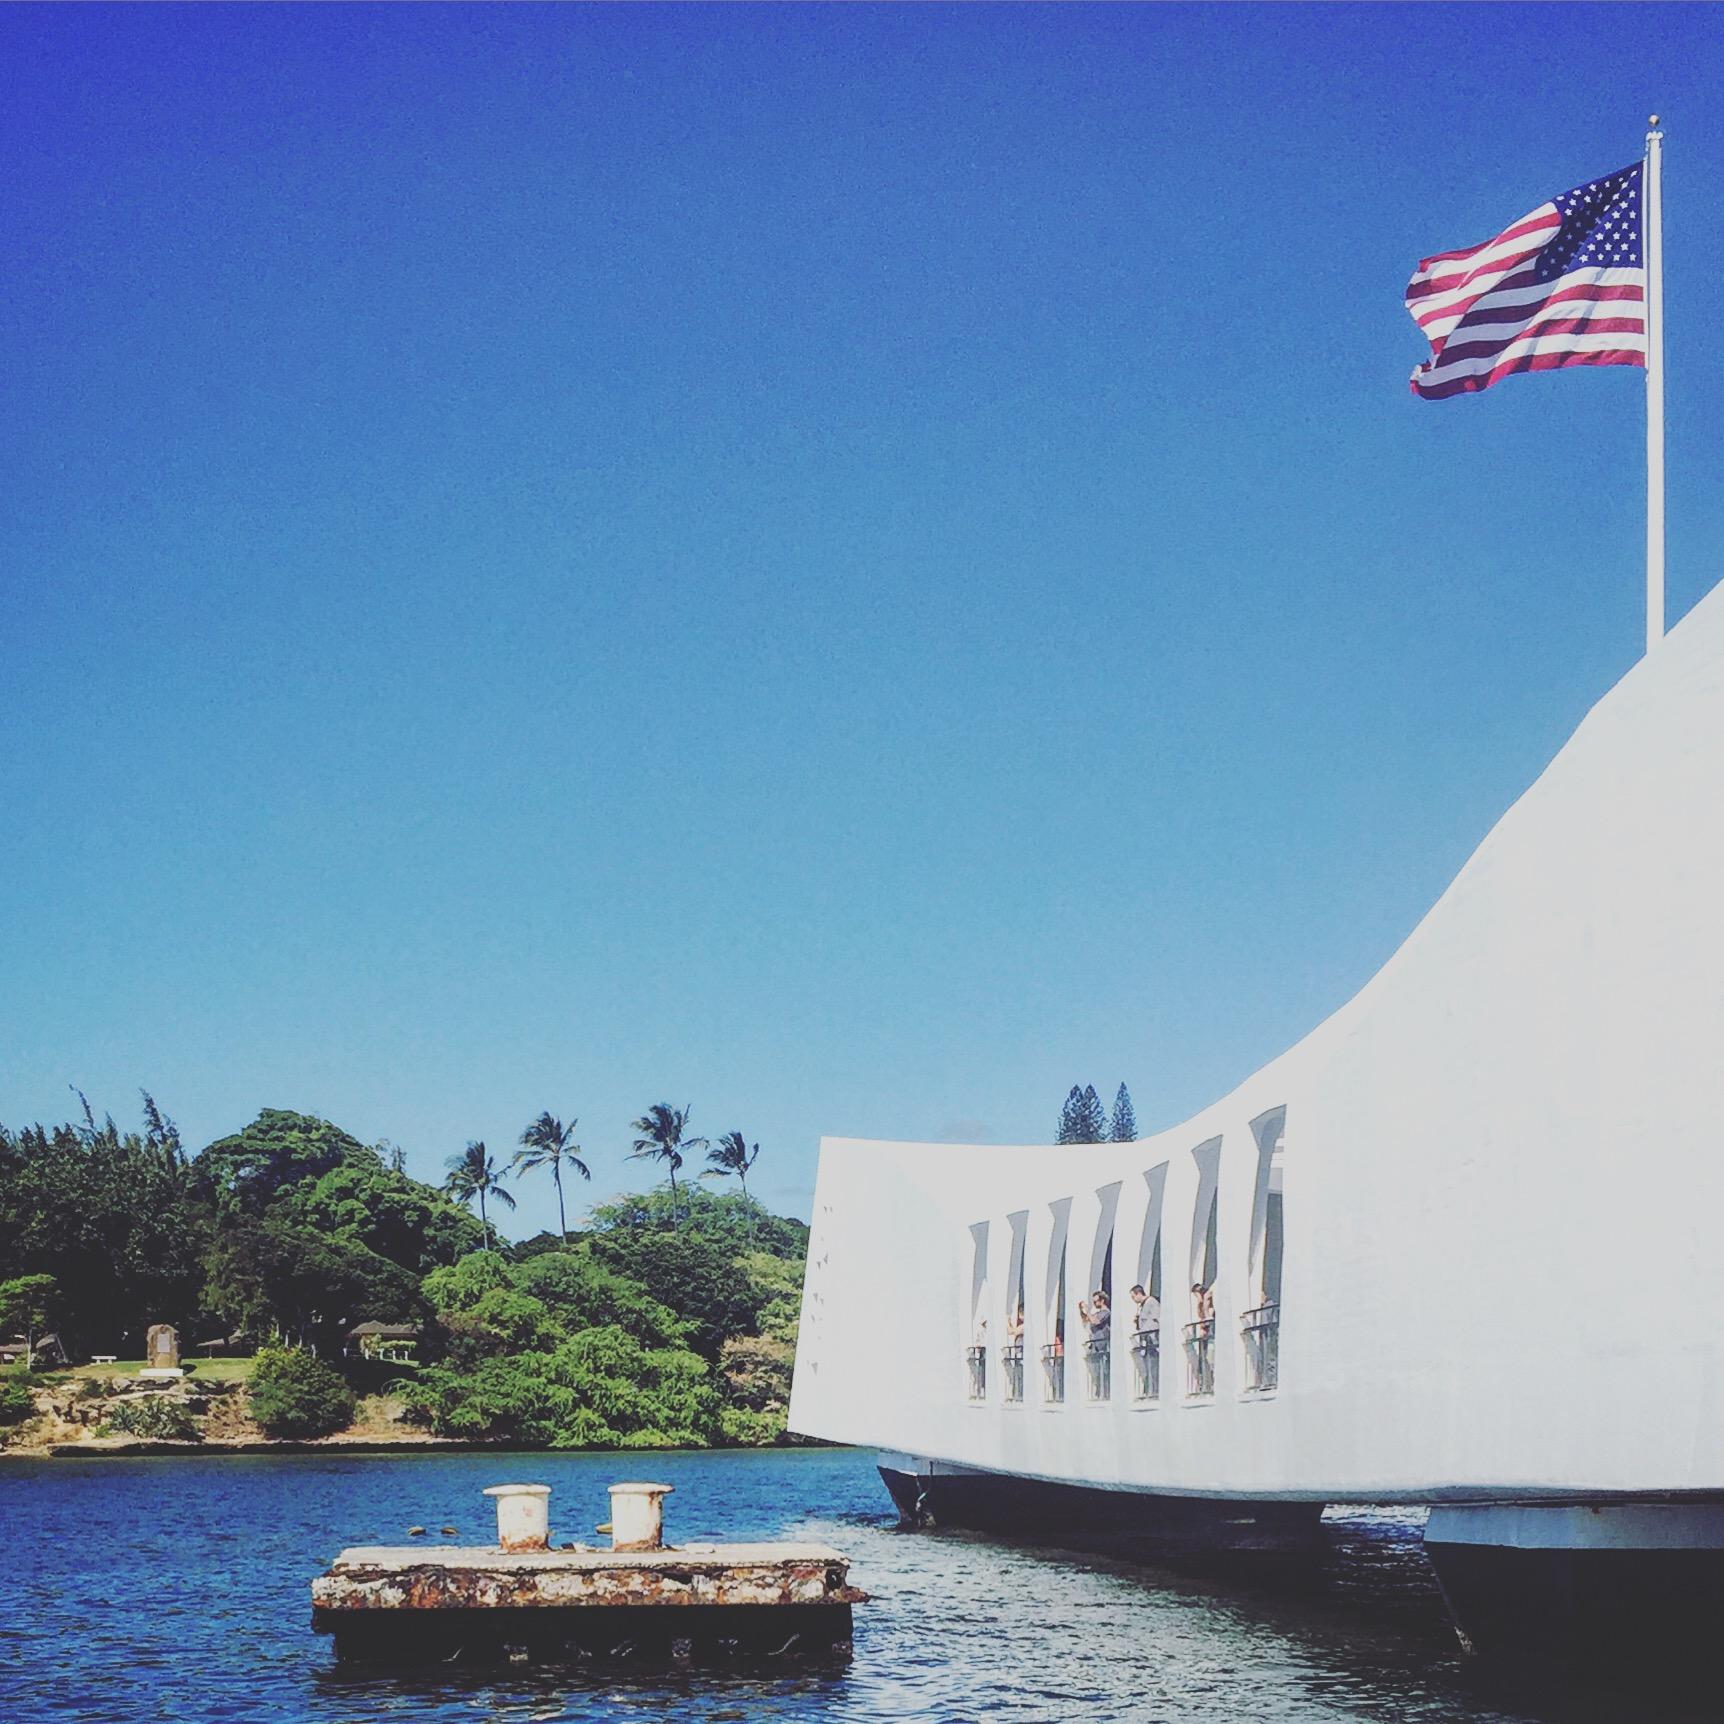 Oahu, Hawaii  in January 2016   Big Island, Hawaii  in August 2016  All photos by Eleanor Cummins